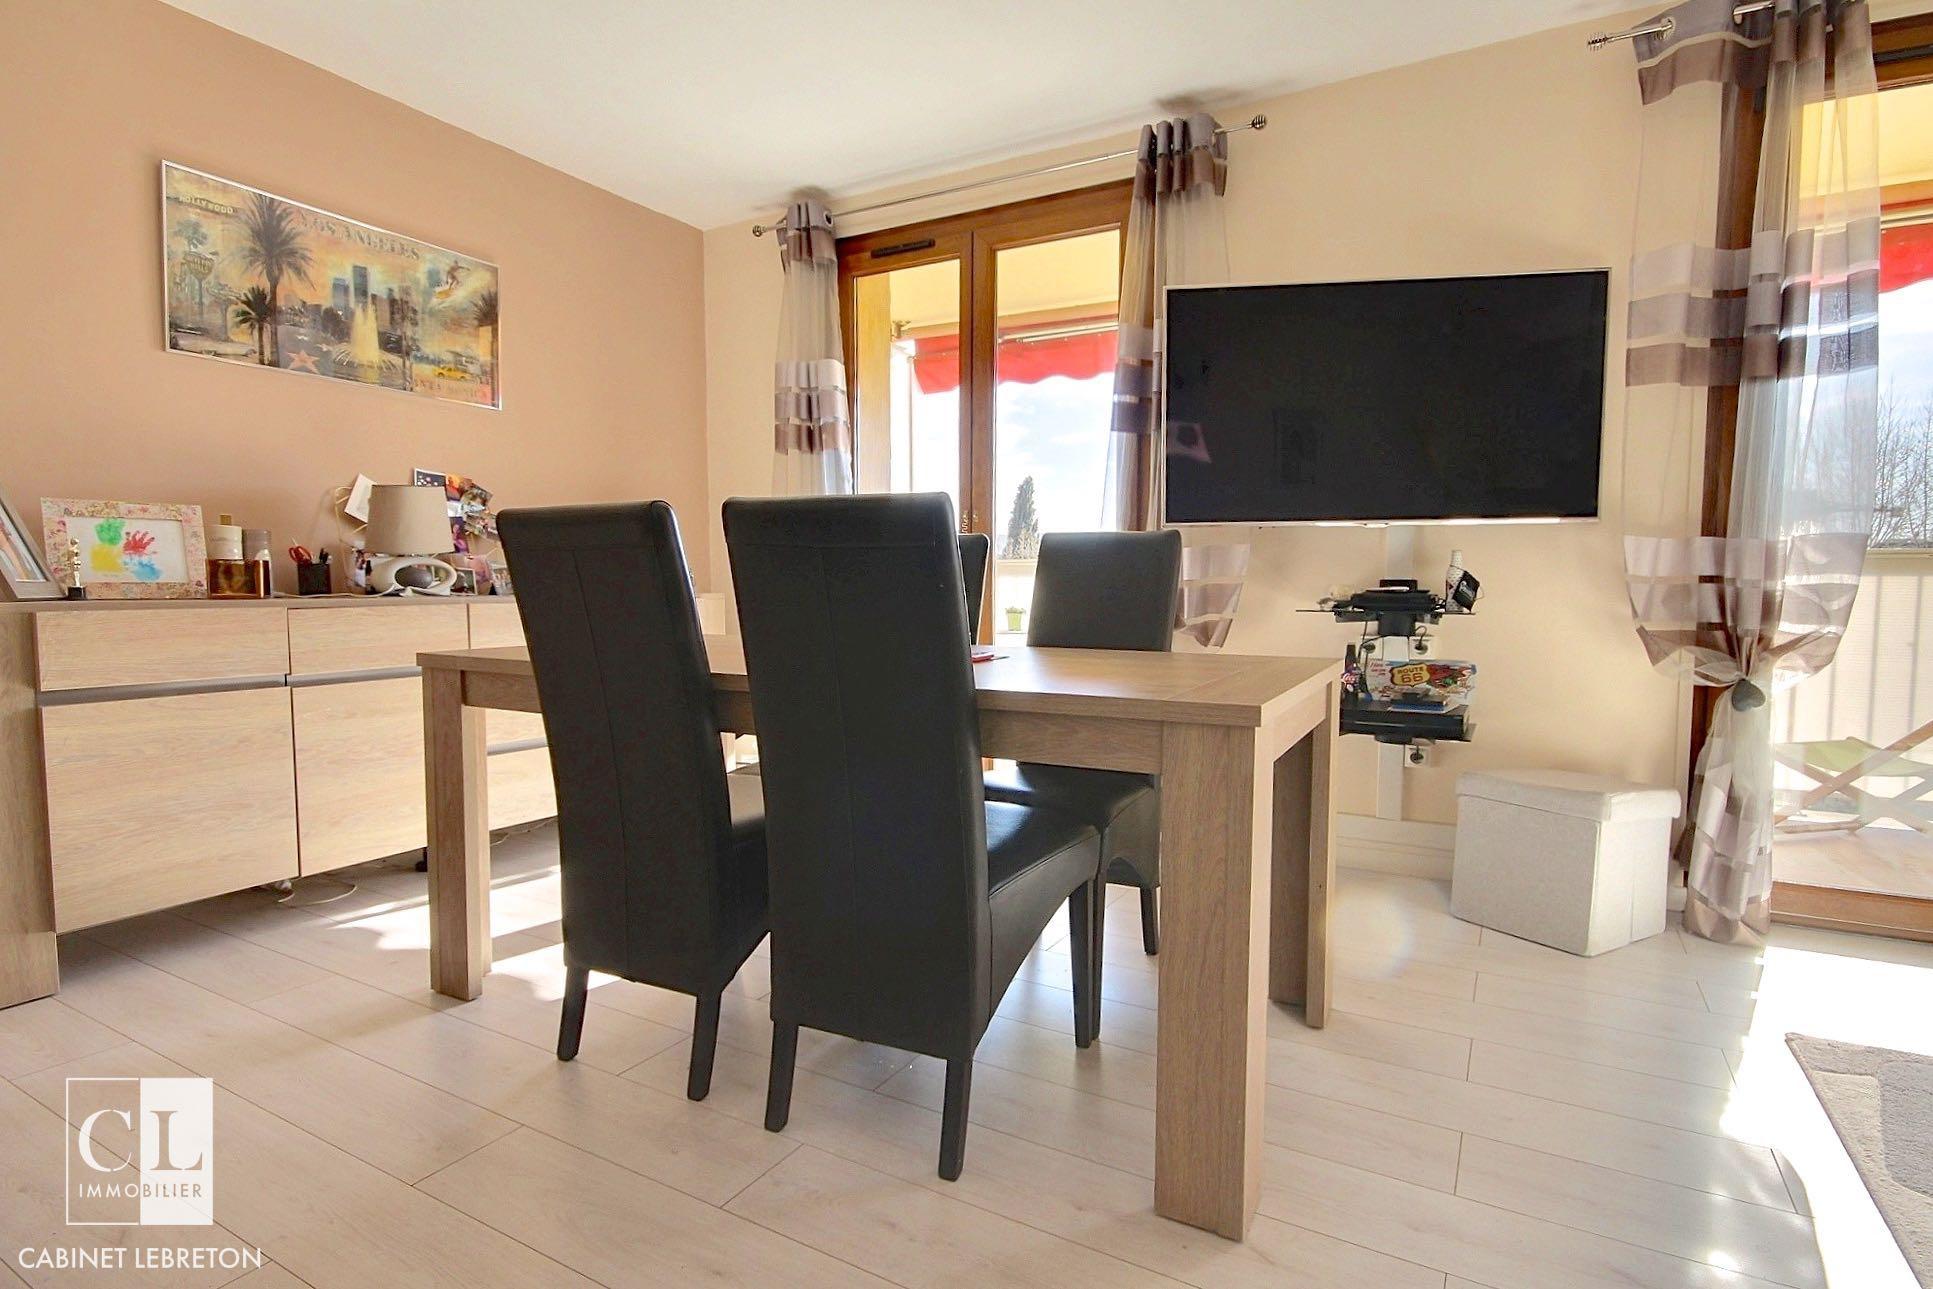 exposio 0004 cabinet lebreton. Black Bedroom Furniture Sets. Home Design Ideas